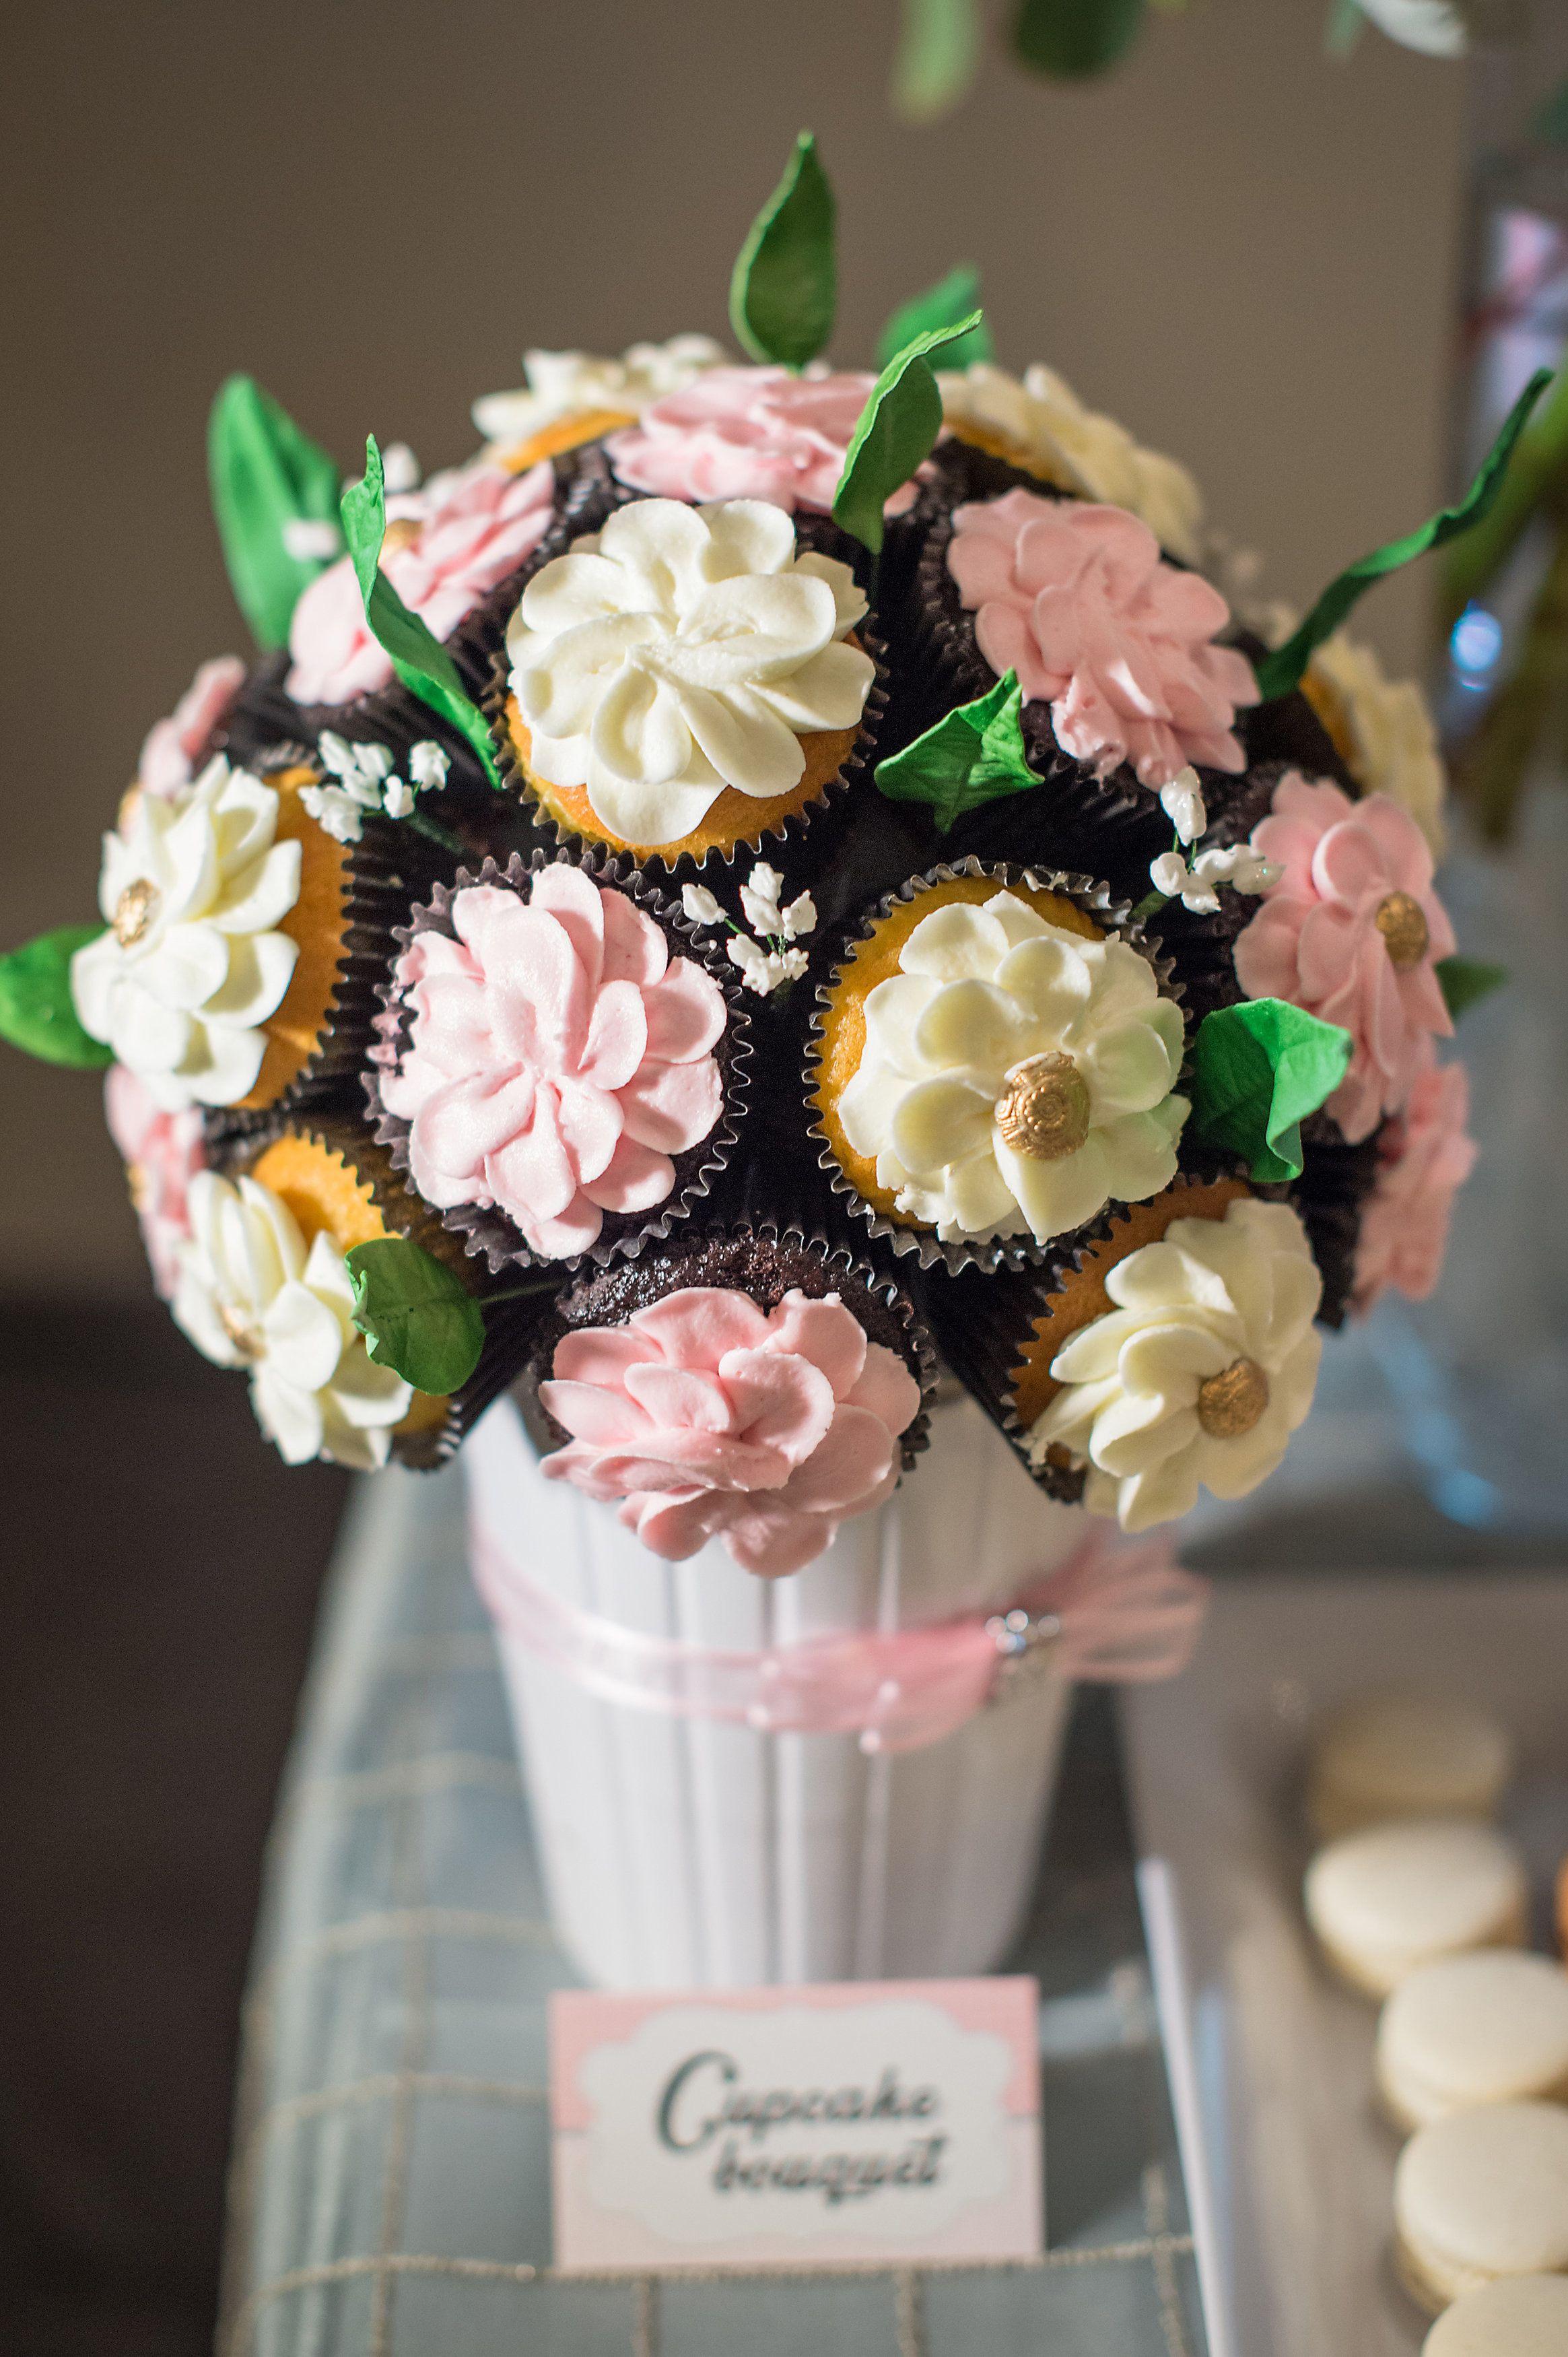 Baking Themed Wedding in Toronto Wedding cupcakes